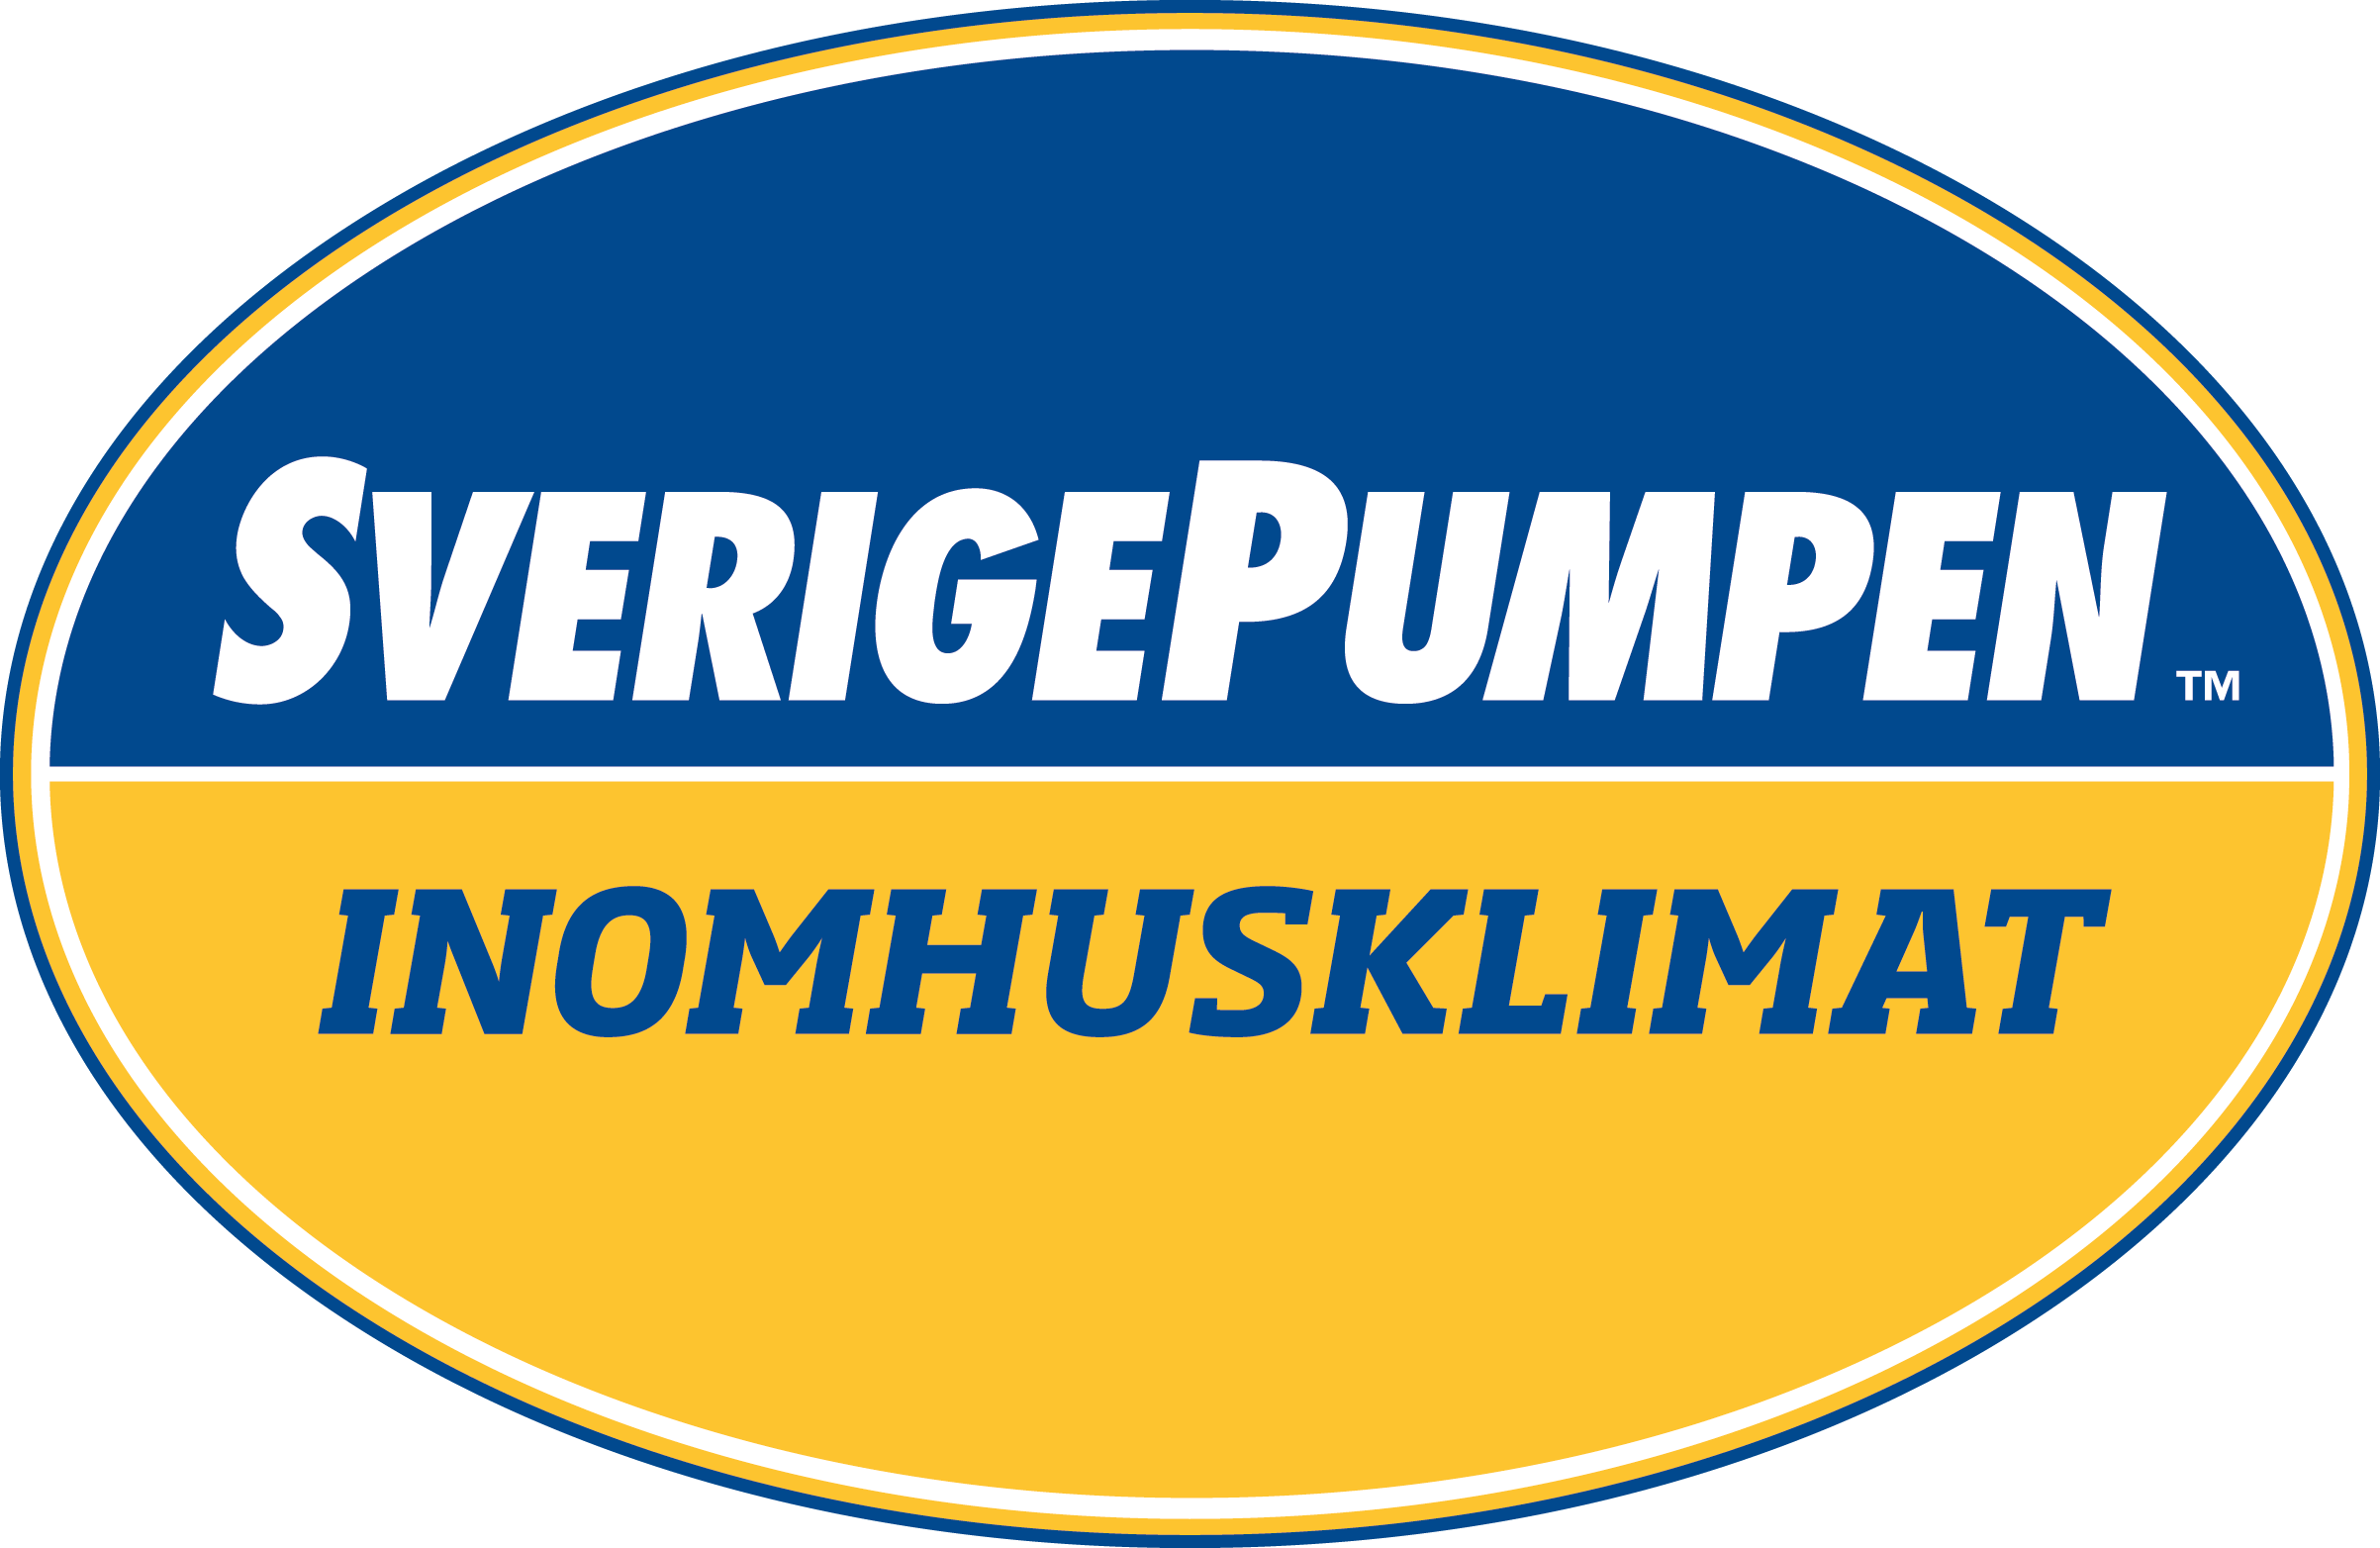 sverigepumpen_inomhusklimat_2017